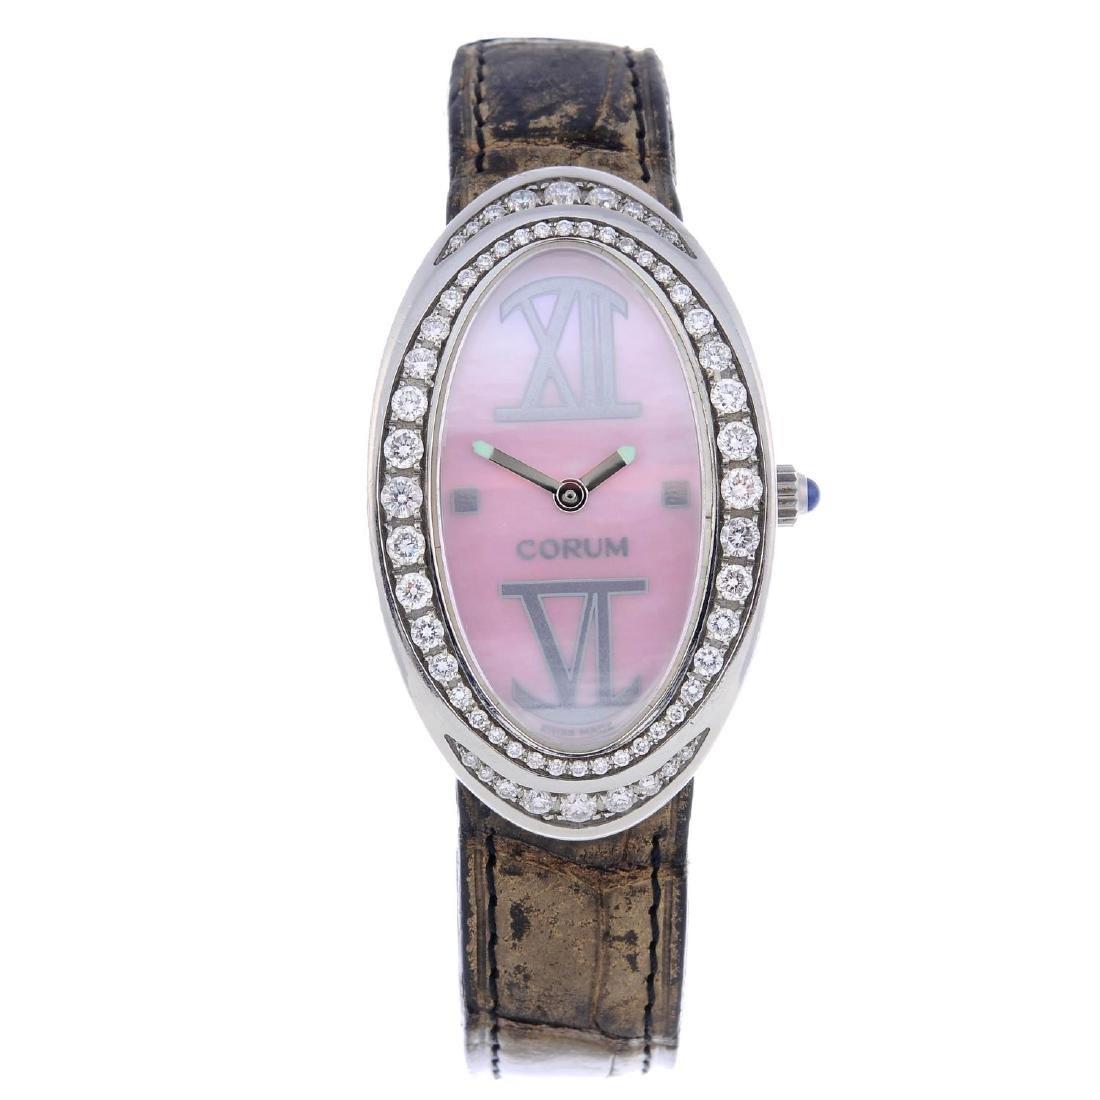 CORUM - a lady's Ovale wrist watch. Stainless steel